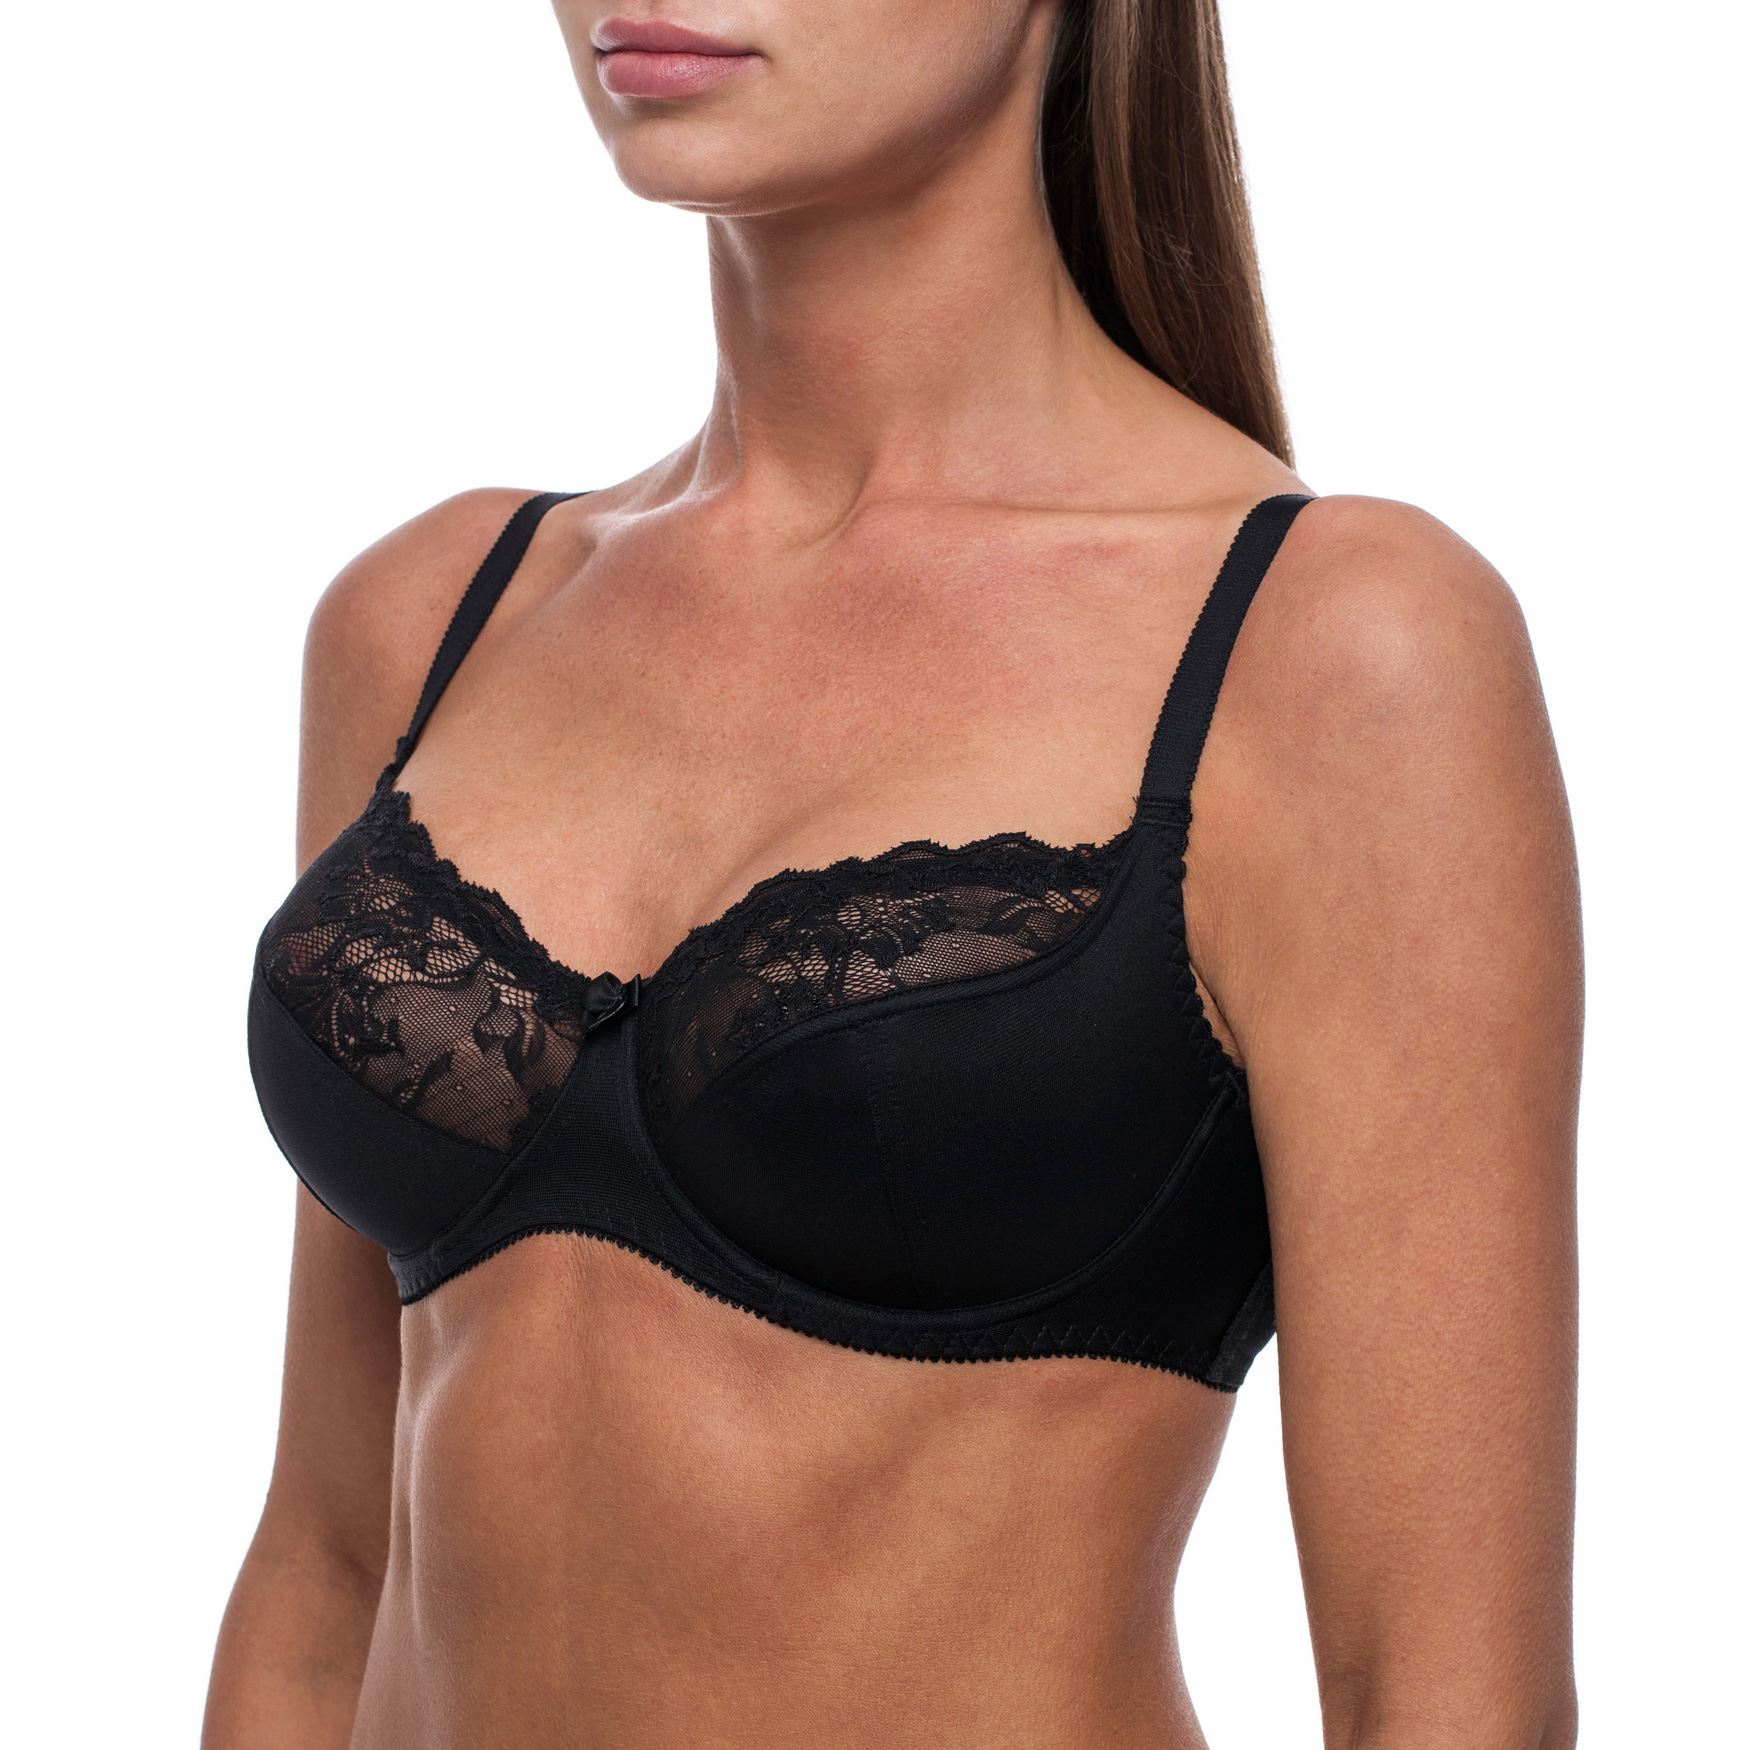 Minimizer-Bra-Sheer-Lace-Unlined-Plus-Size-Comfort-Full-Coverage-Sleep-Figure thumbnail 14